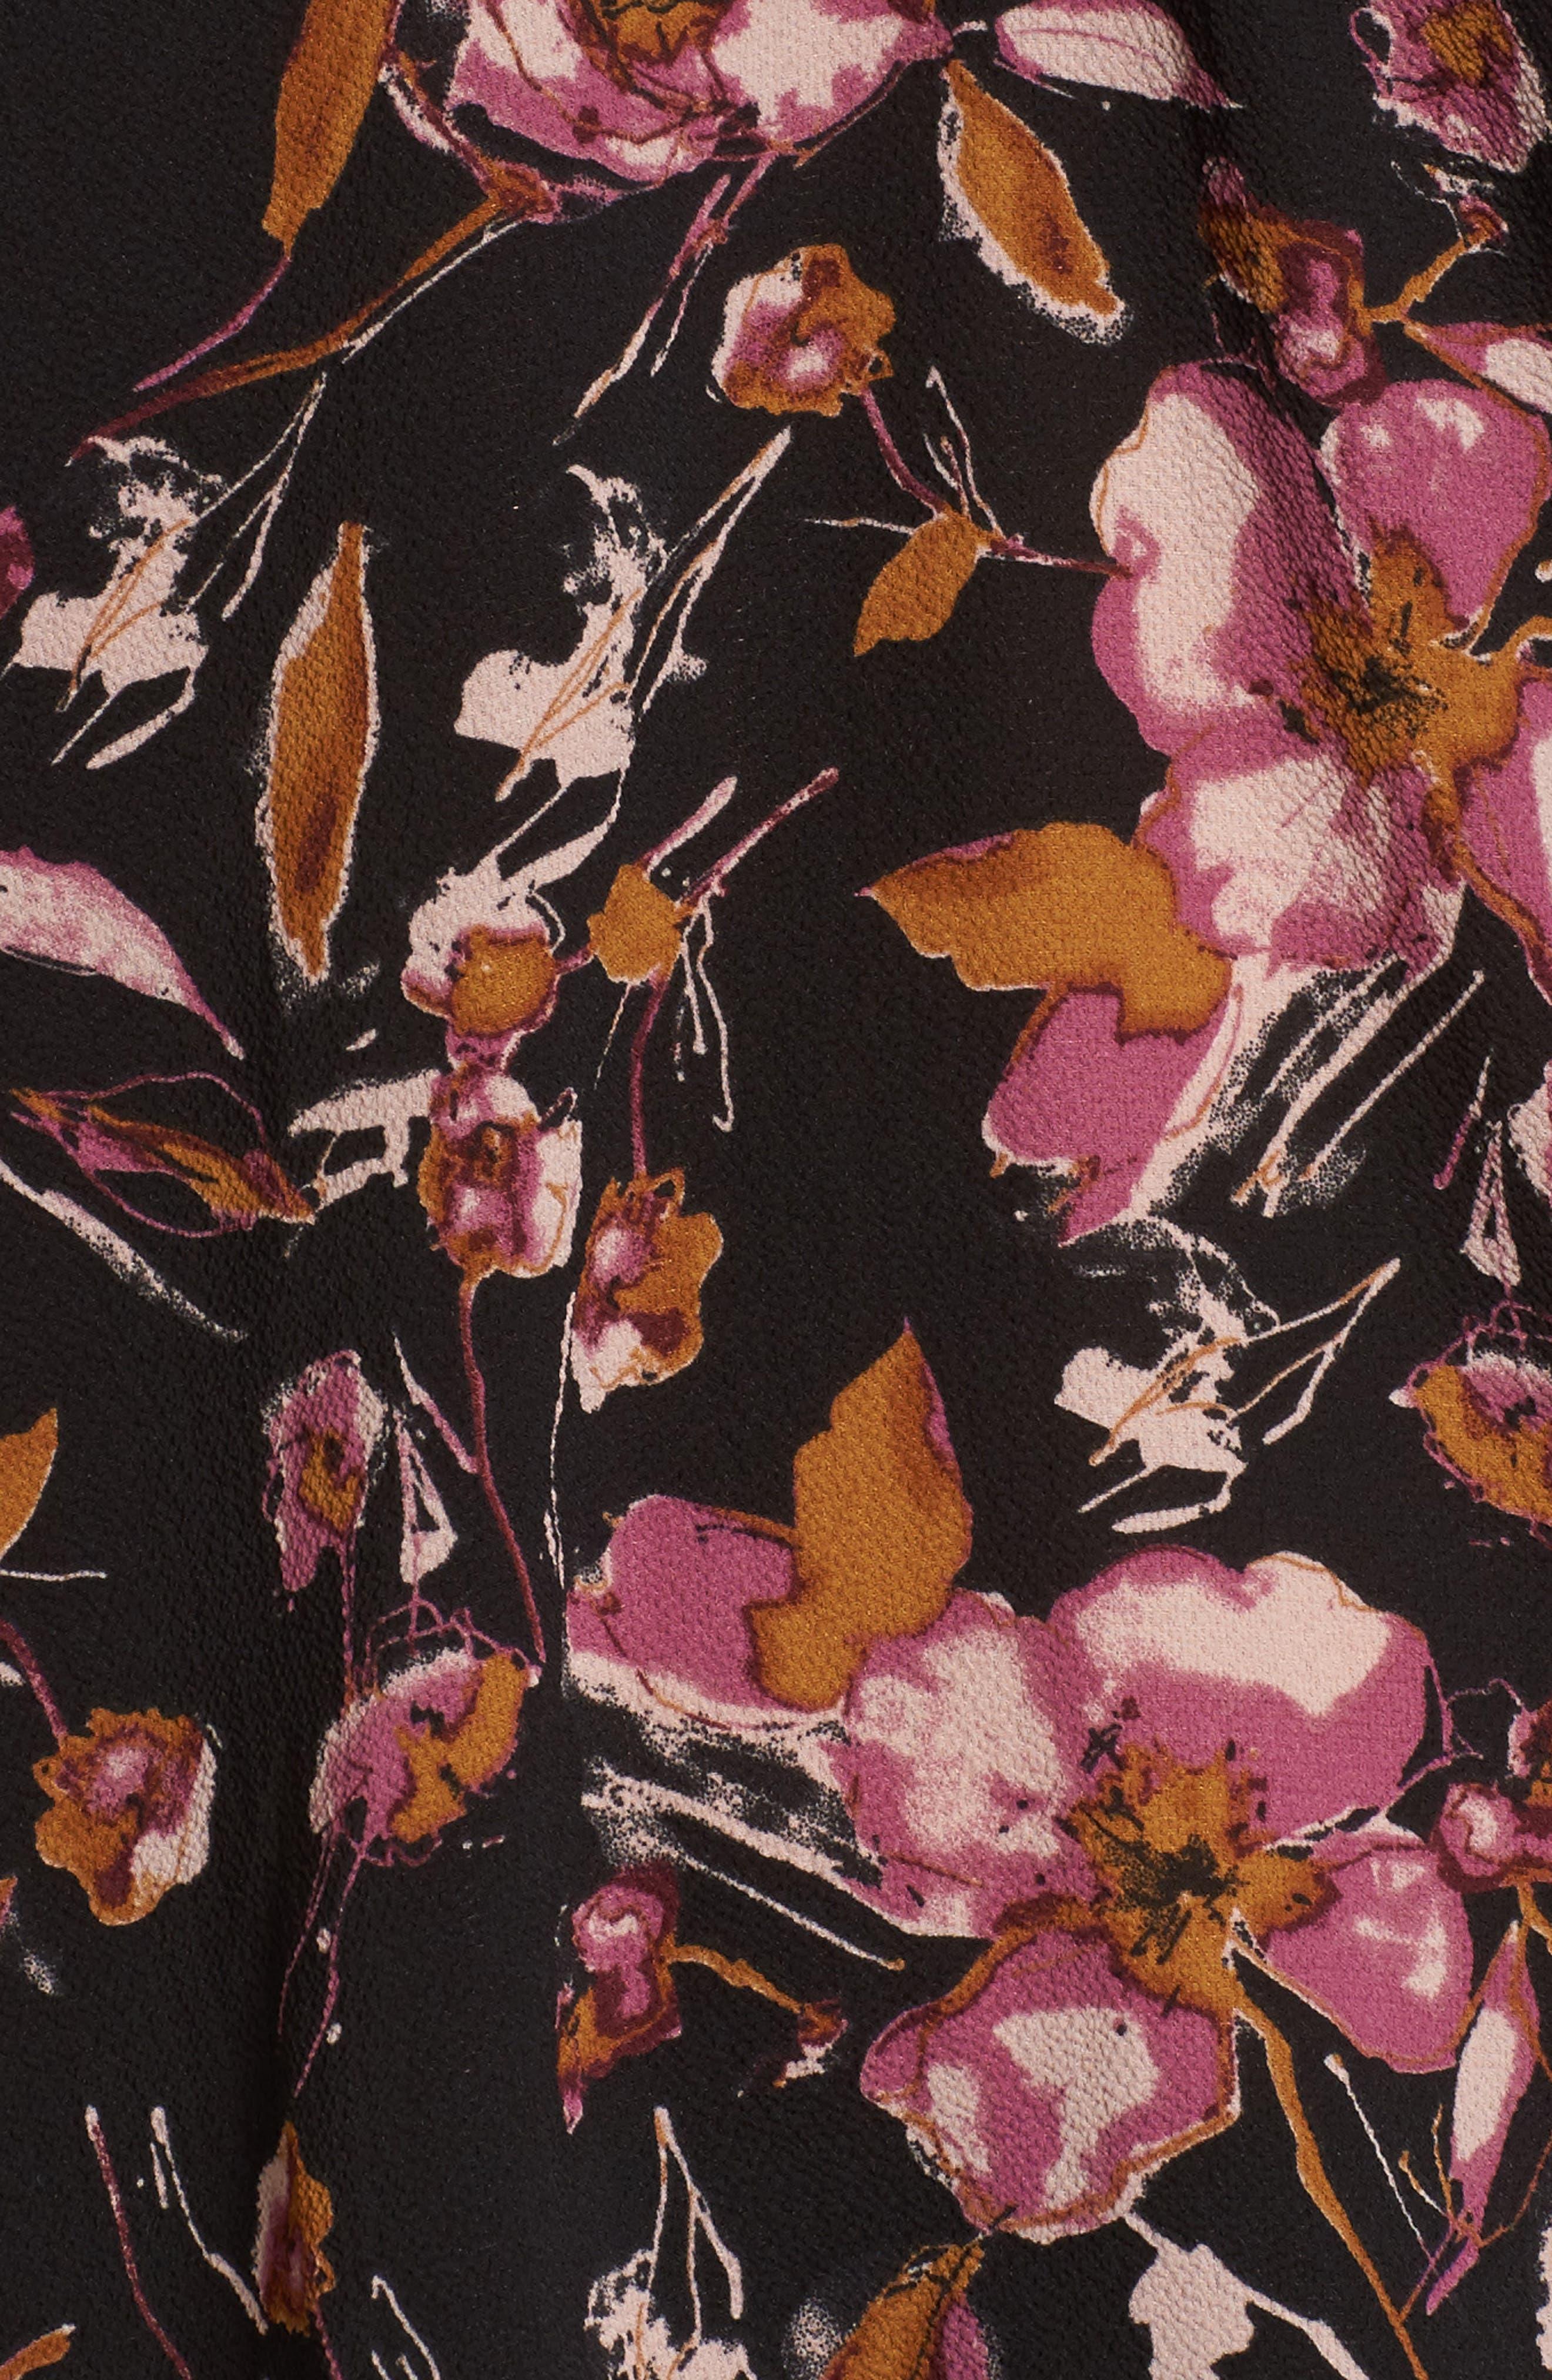 Ruffle Print Off the Shoulder Blouse,                             Alternate thumbnail 5, color,                             001